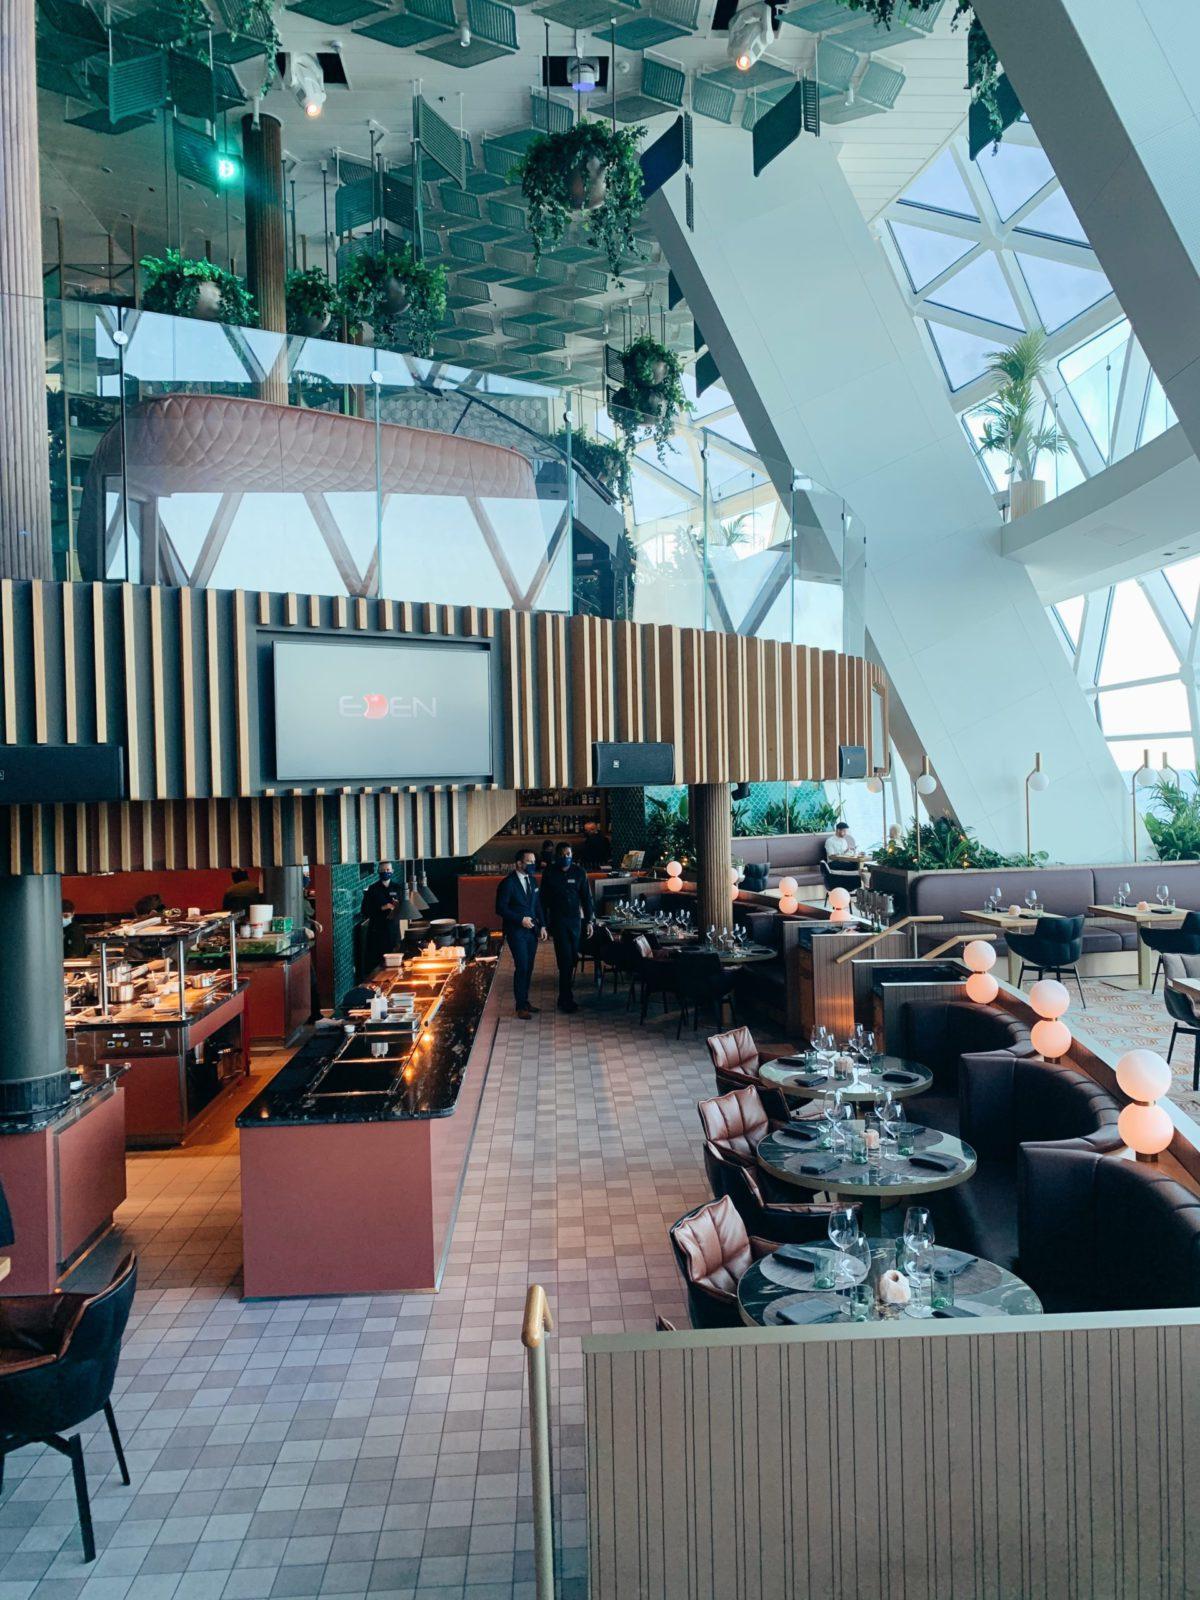 Eden Restaurant Dining Area